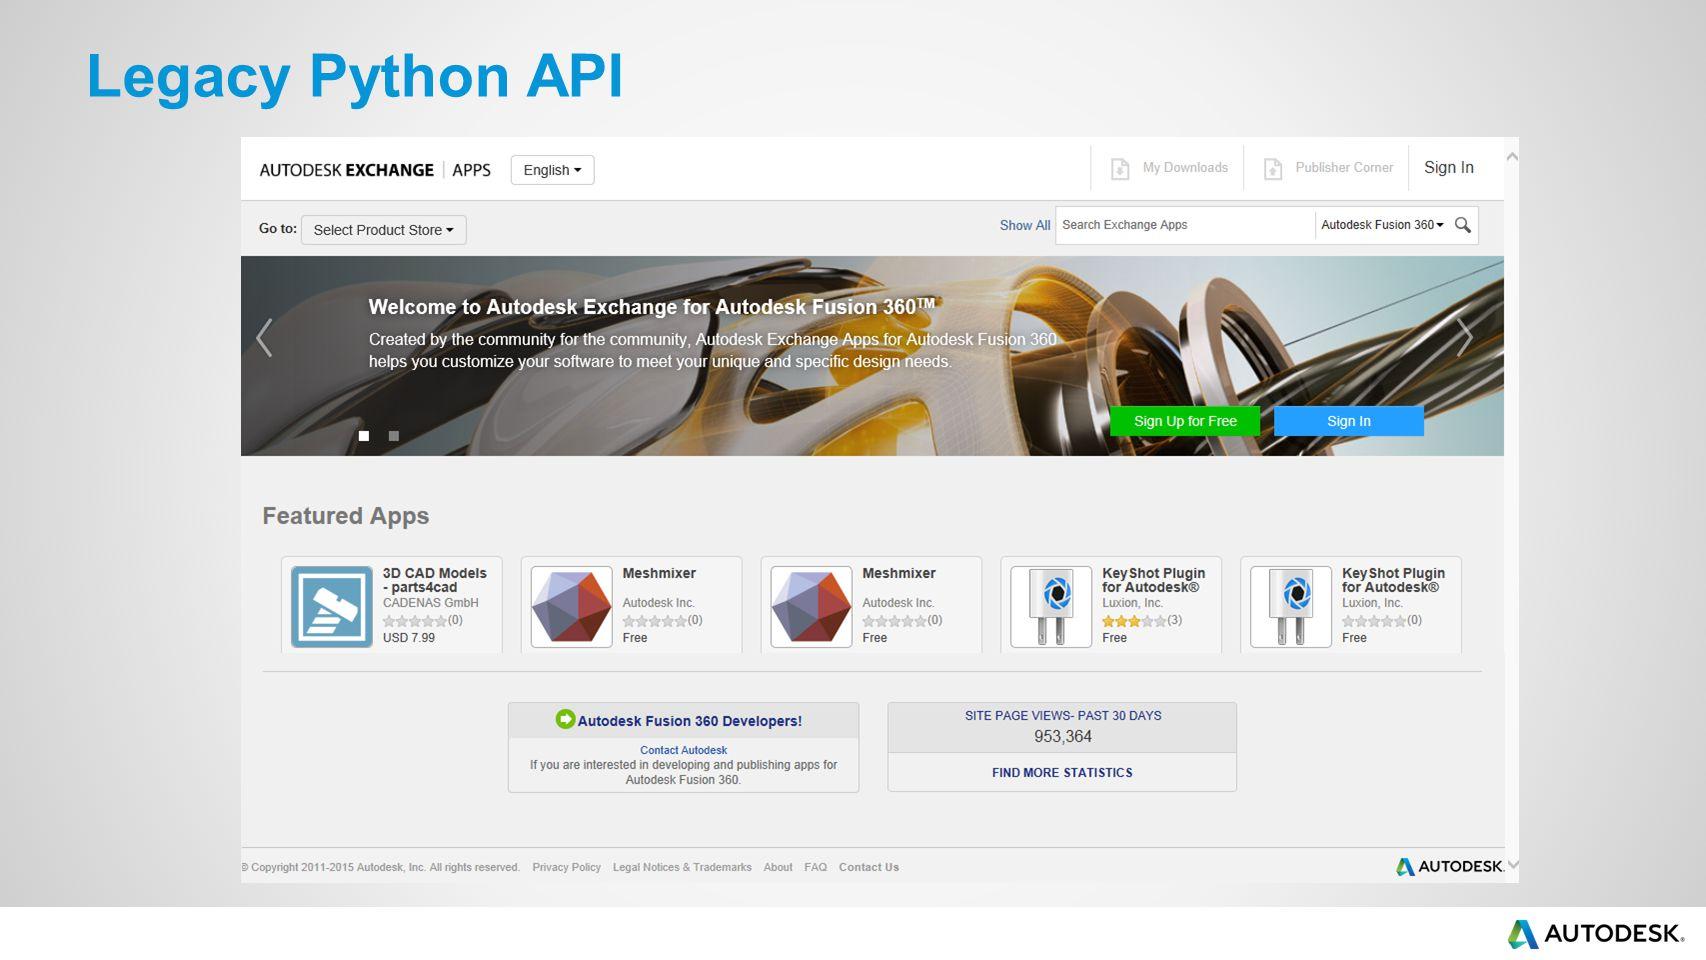 Legacy Python API